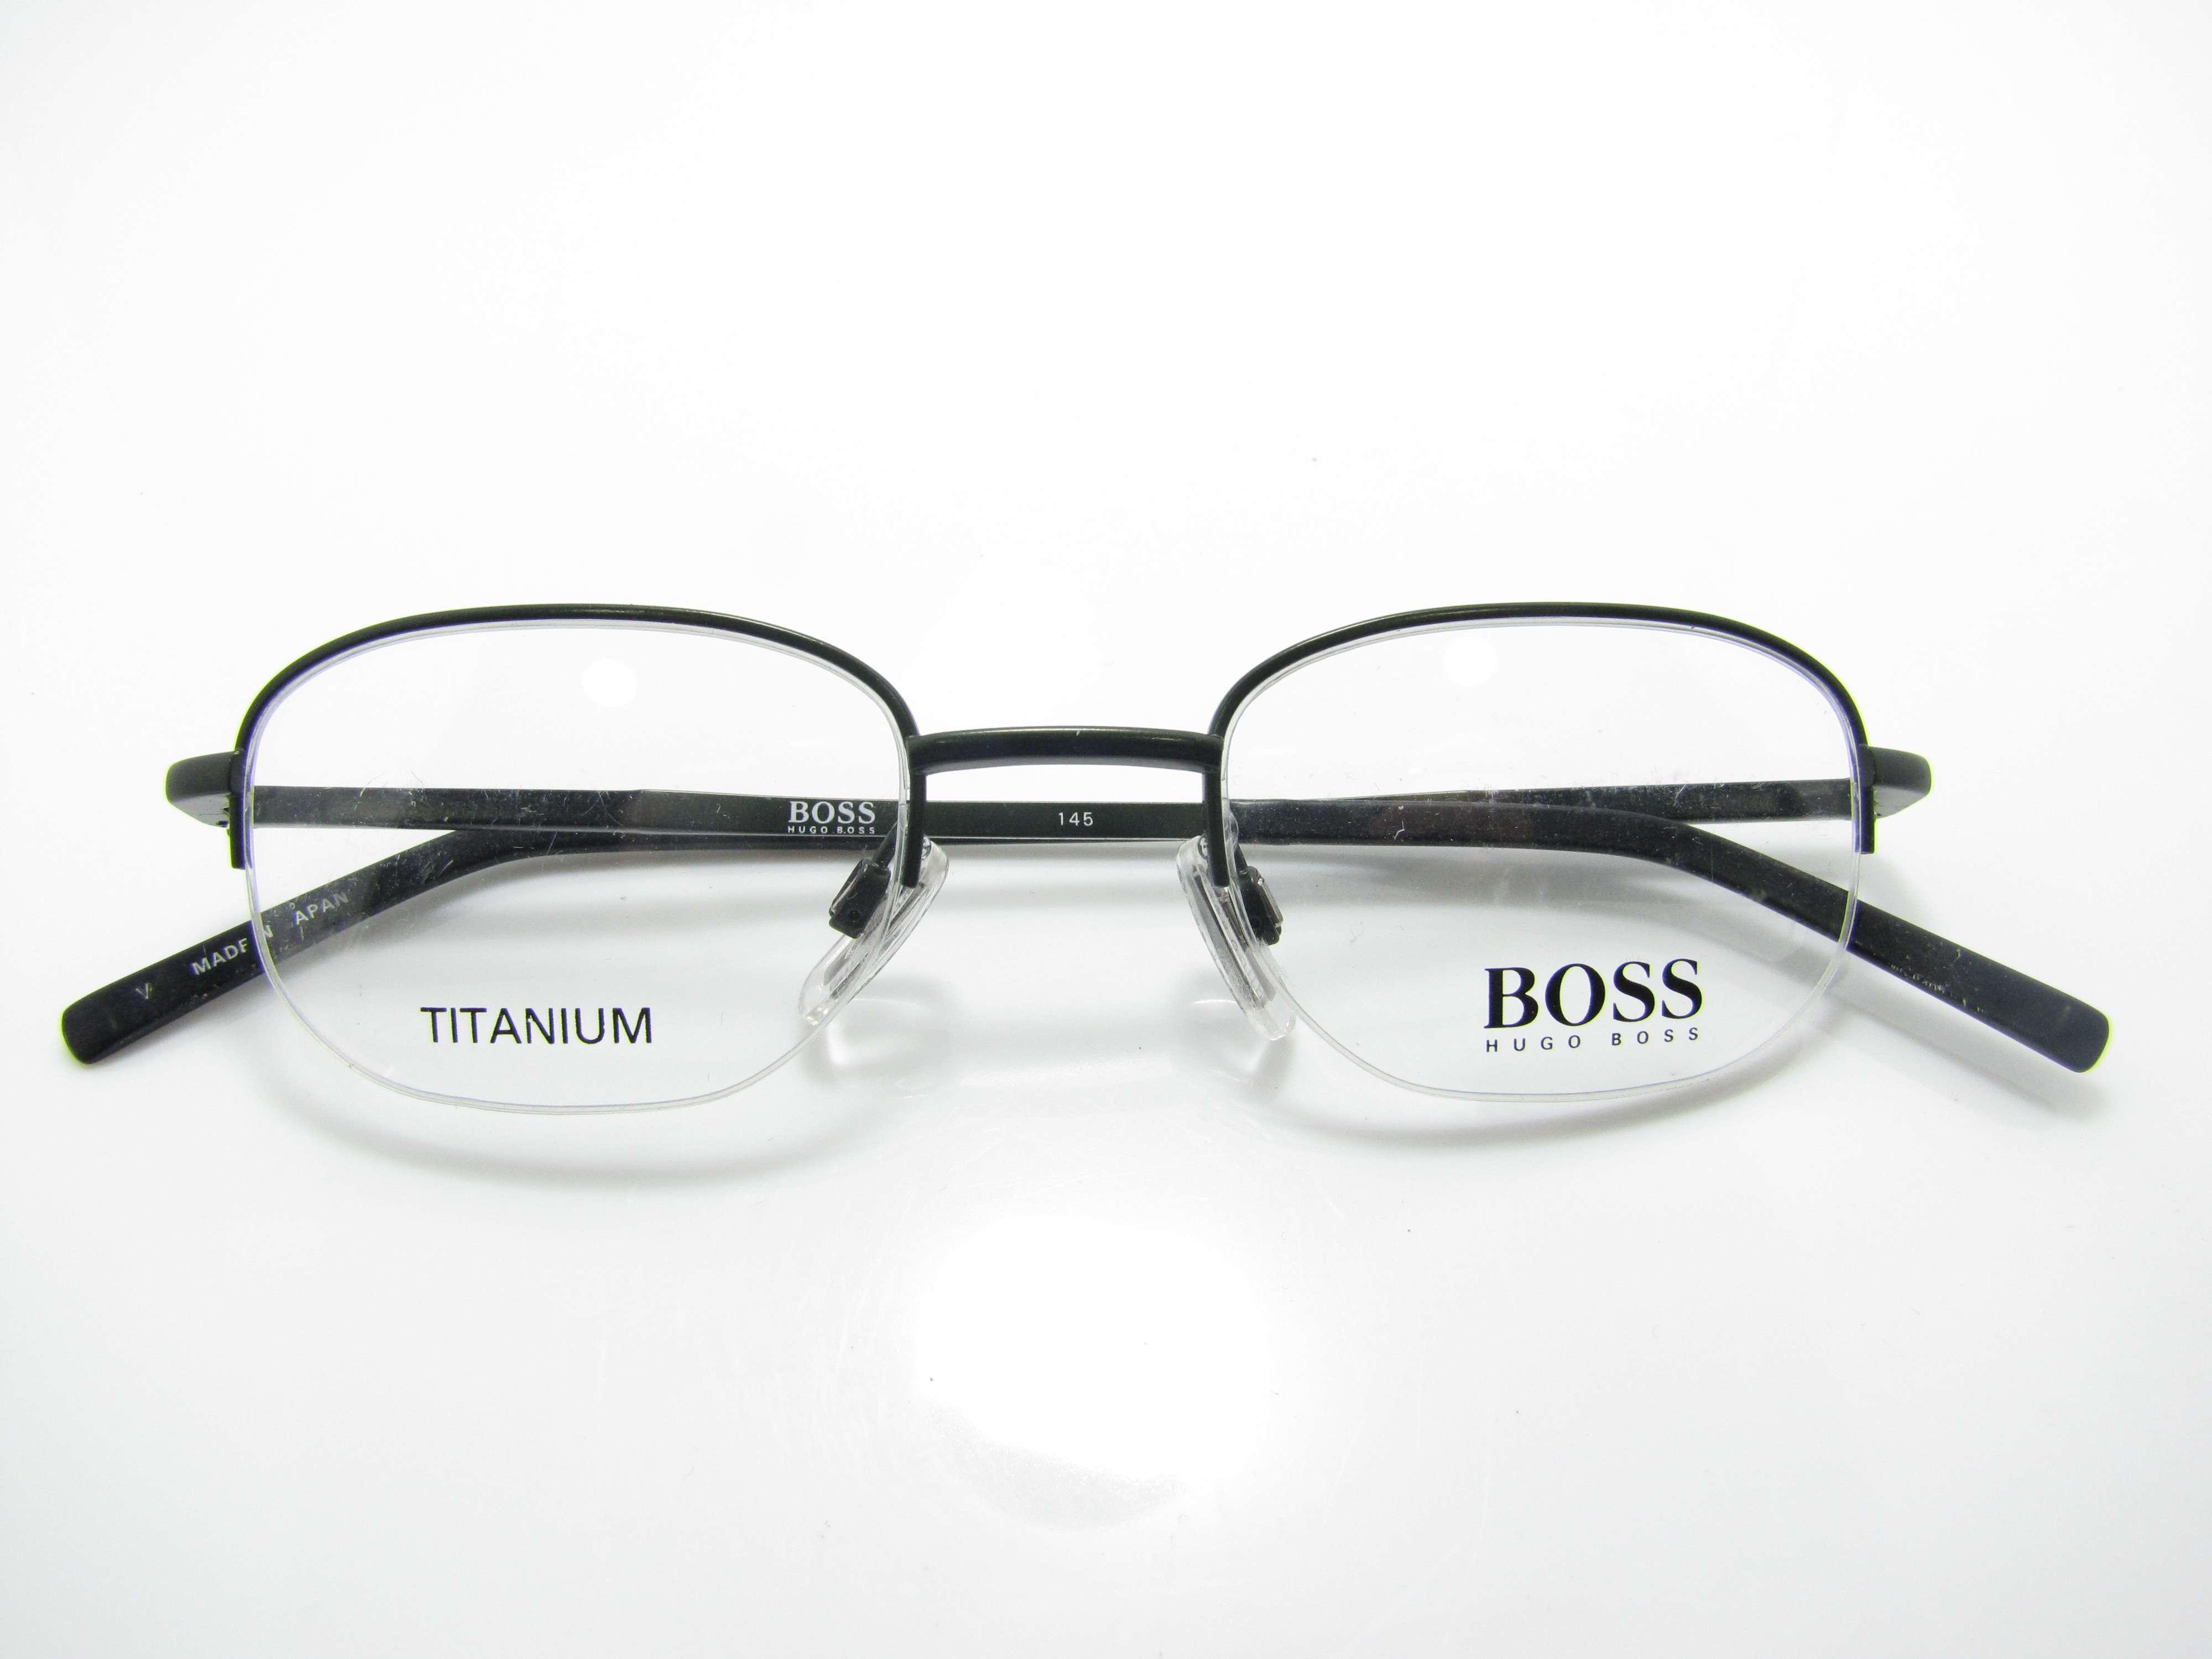 44f050a69b Hugo Boss Eyeglasses New Eyewear Frames Glasses Original Mod HB1562